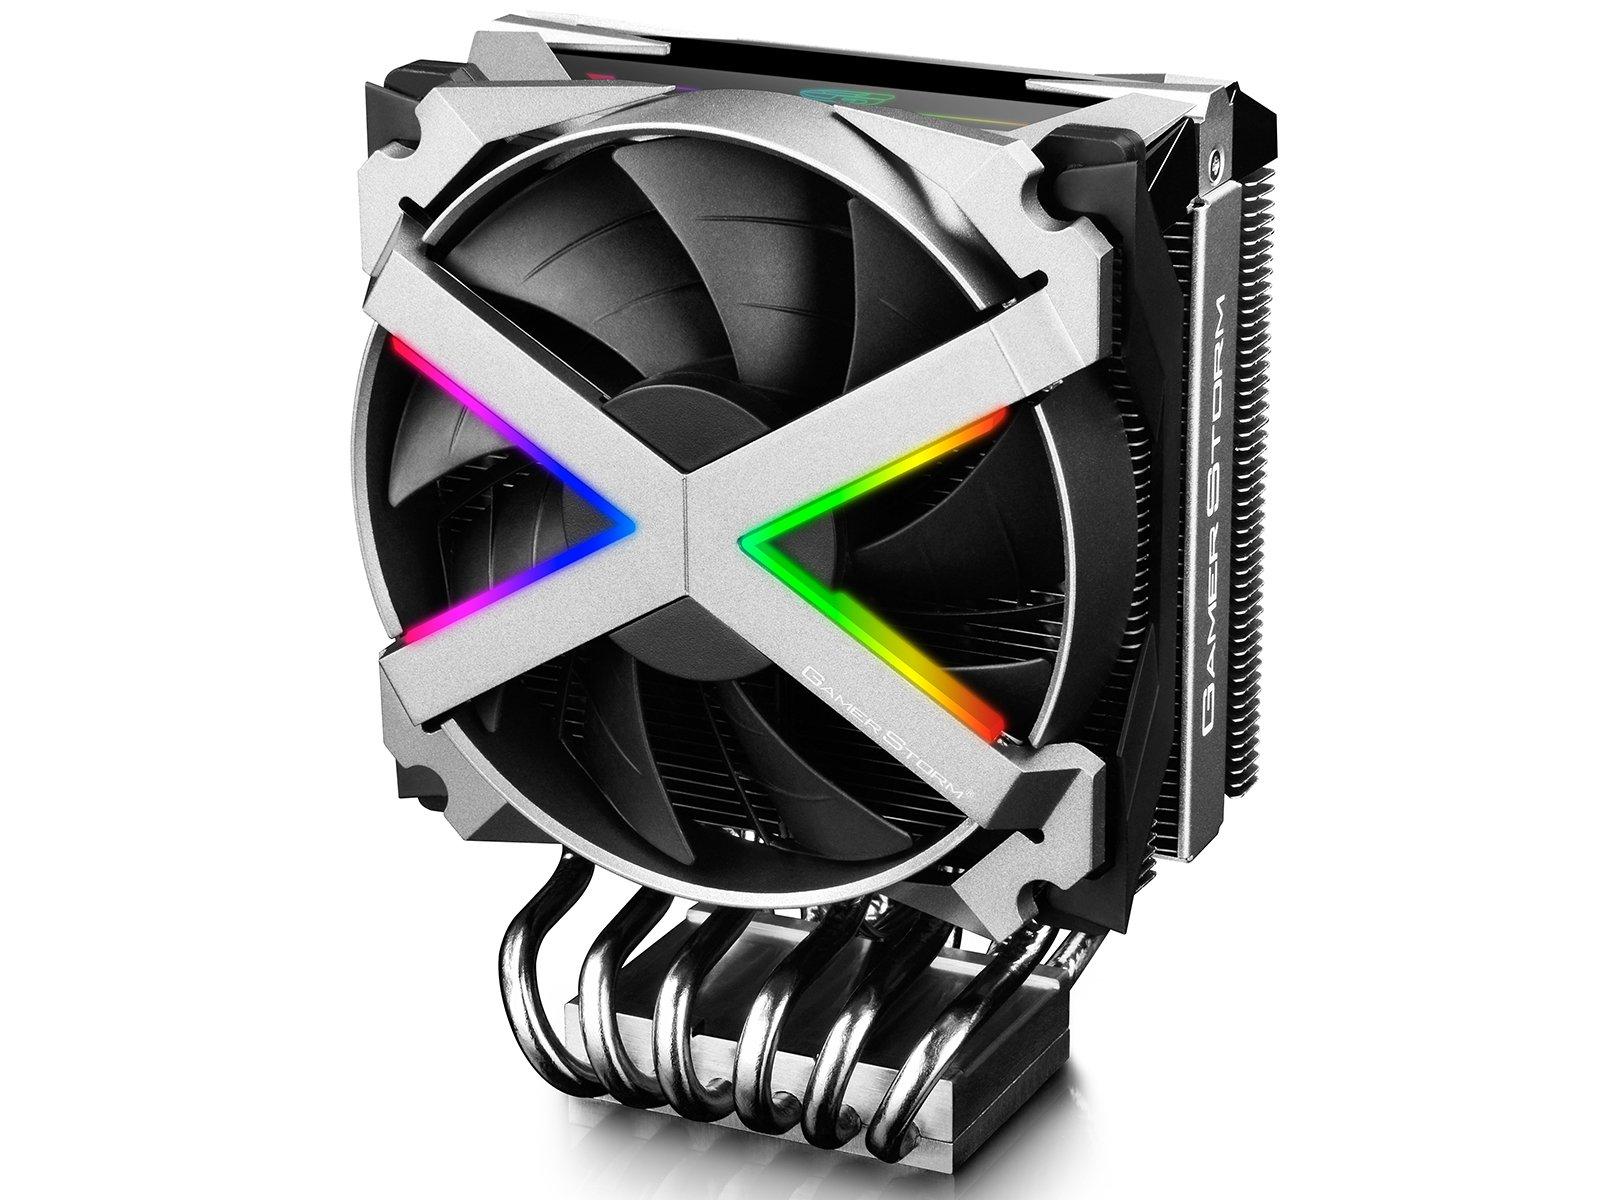 DeepCool Gamer Strom 6 Nickel Plated Heatpipe Metal Frame RGB Fan Add RGB Lighting System Compatible TR4 Perfectly (FRYZEN)